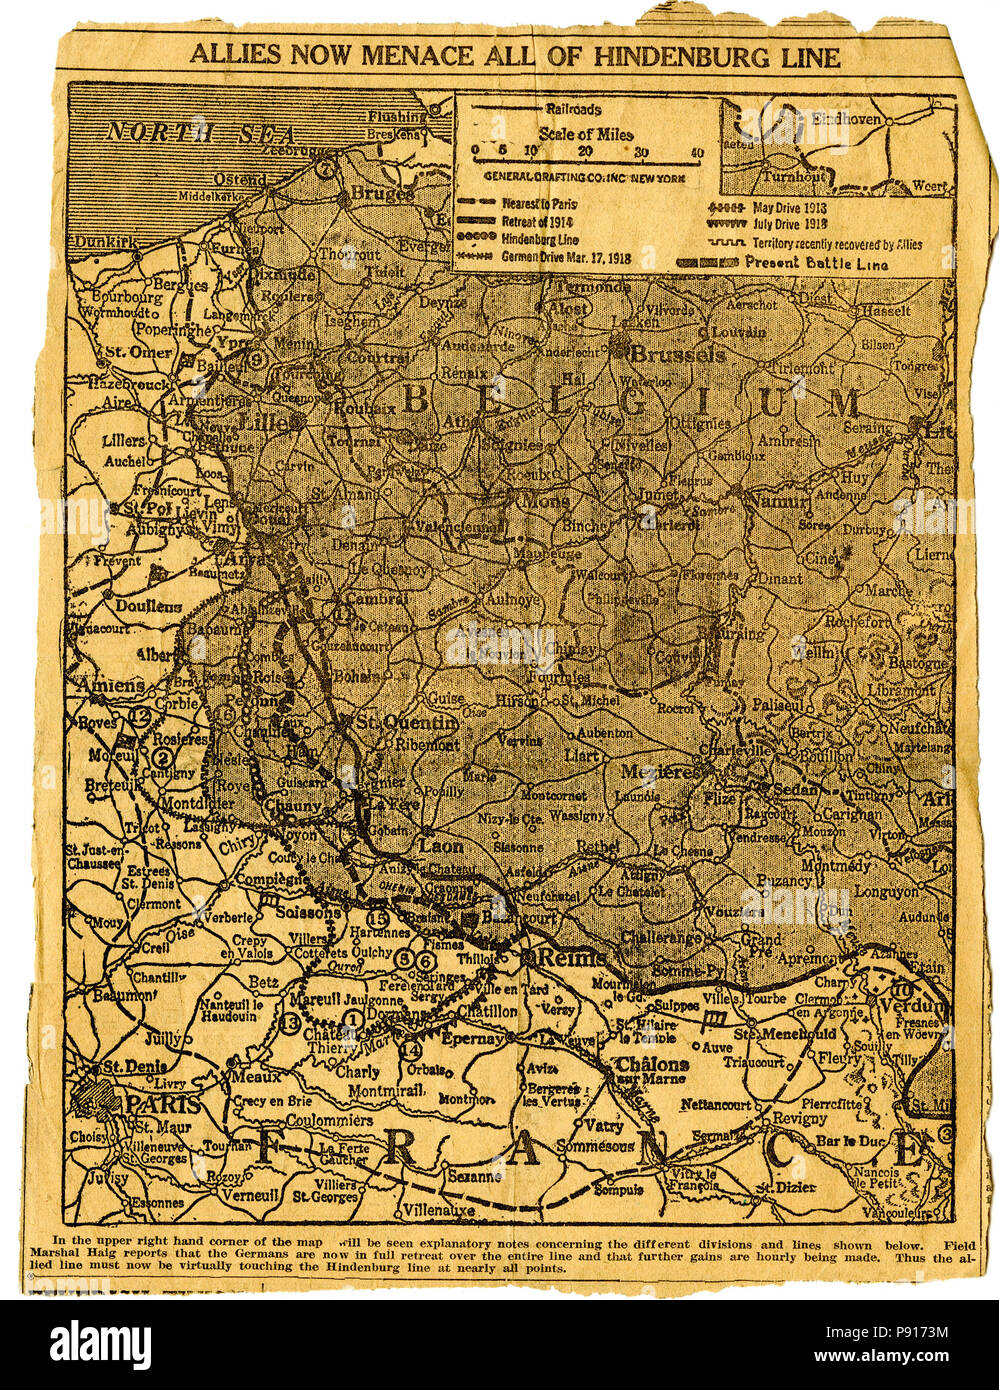 1918 Map Europe Stock Photos & 1918 Map Europe Stock Images - Alamy